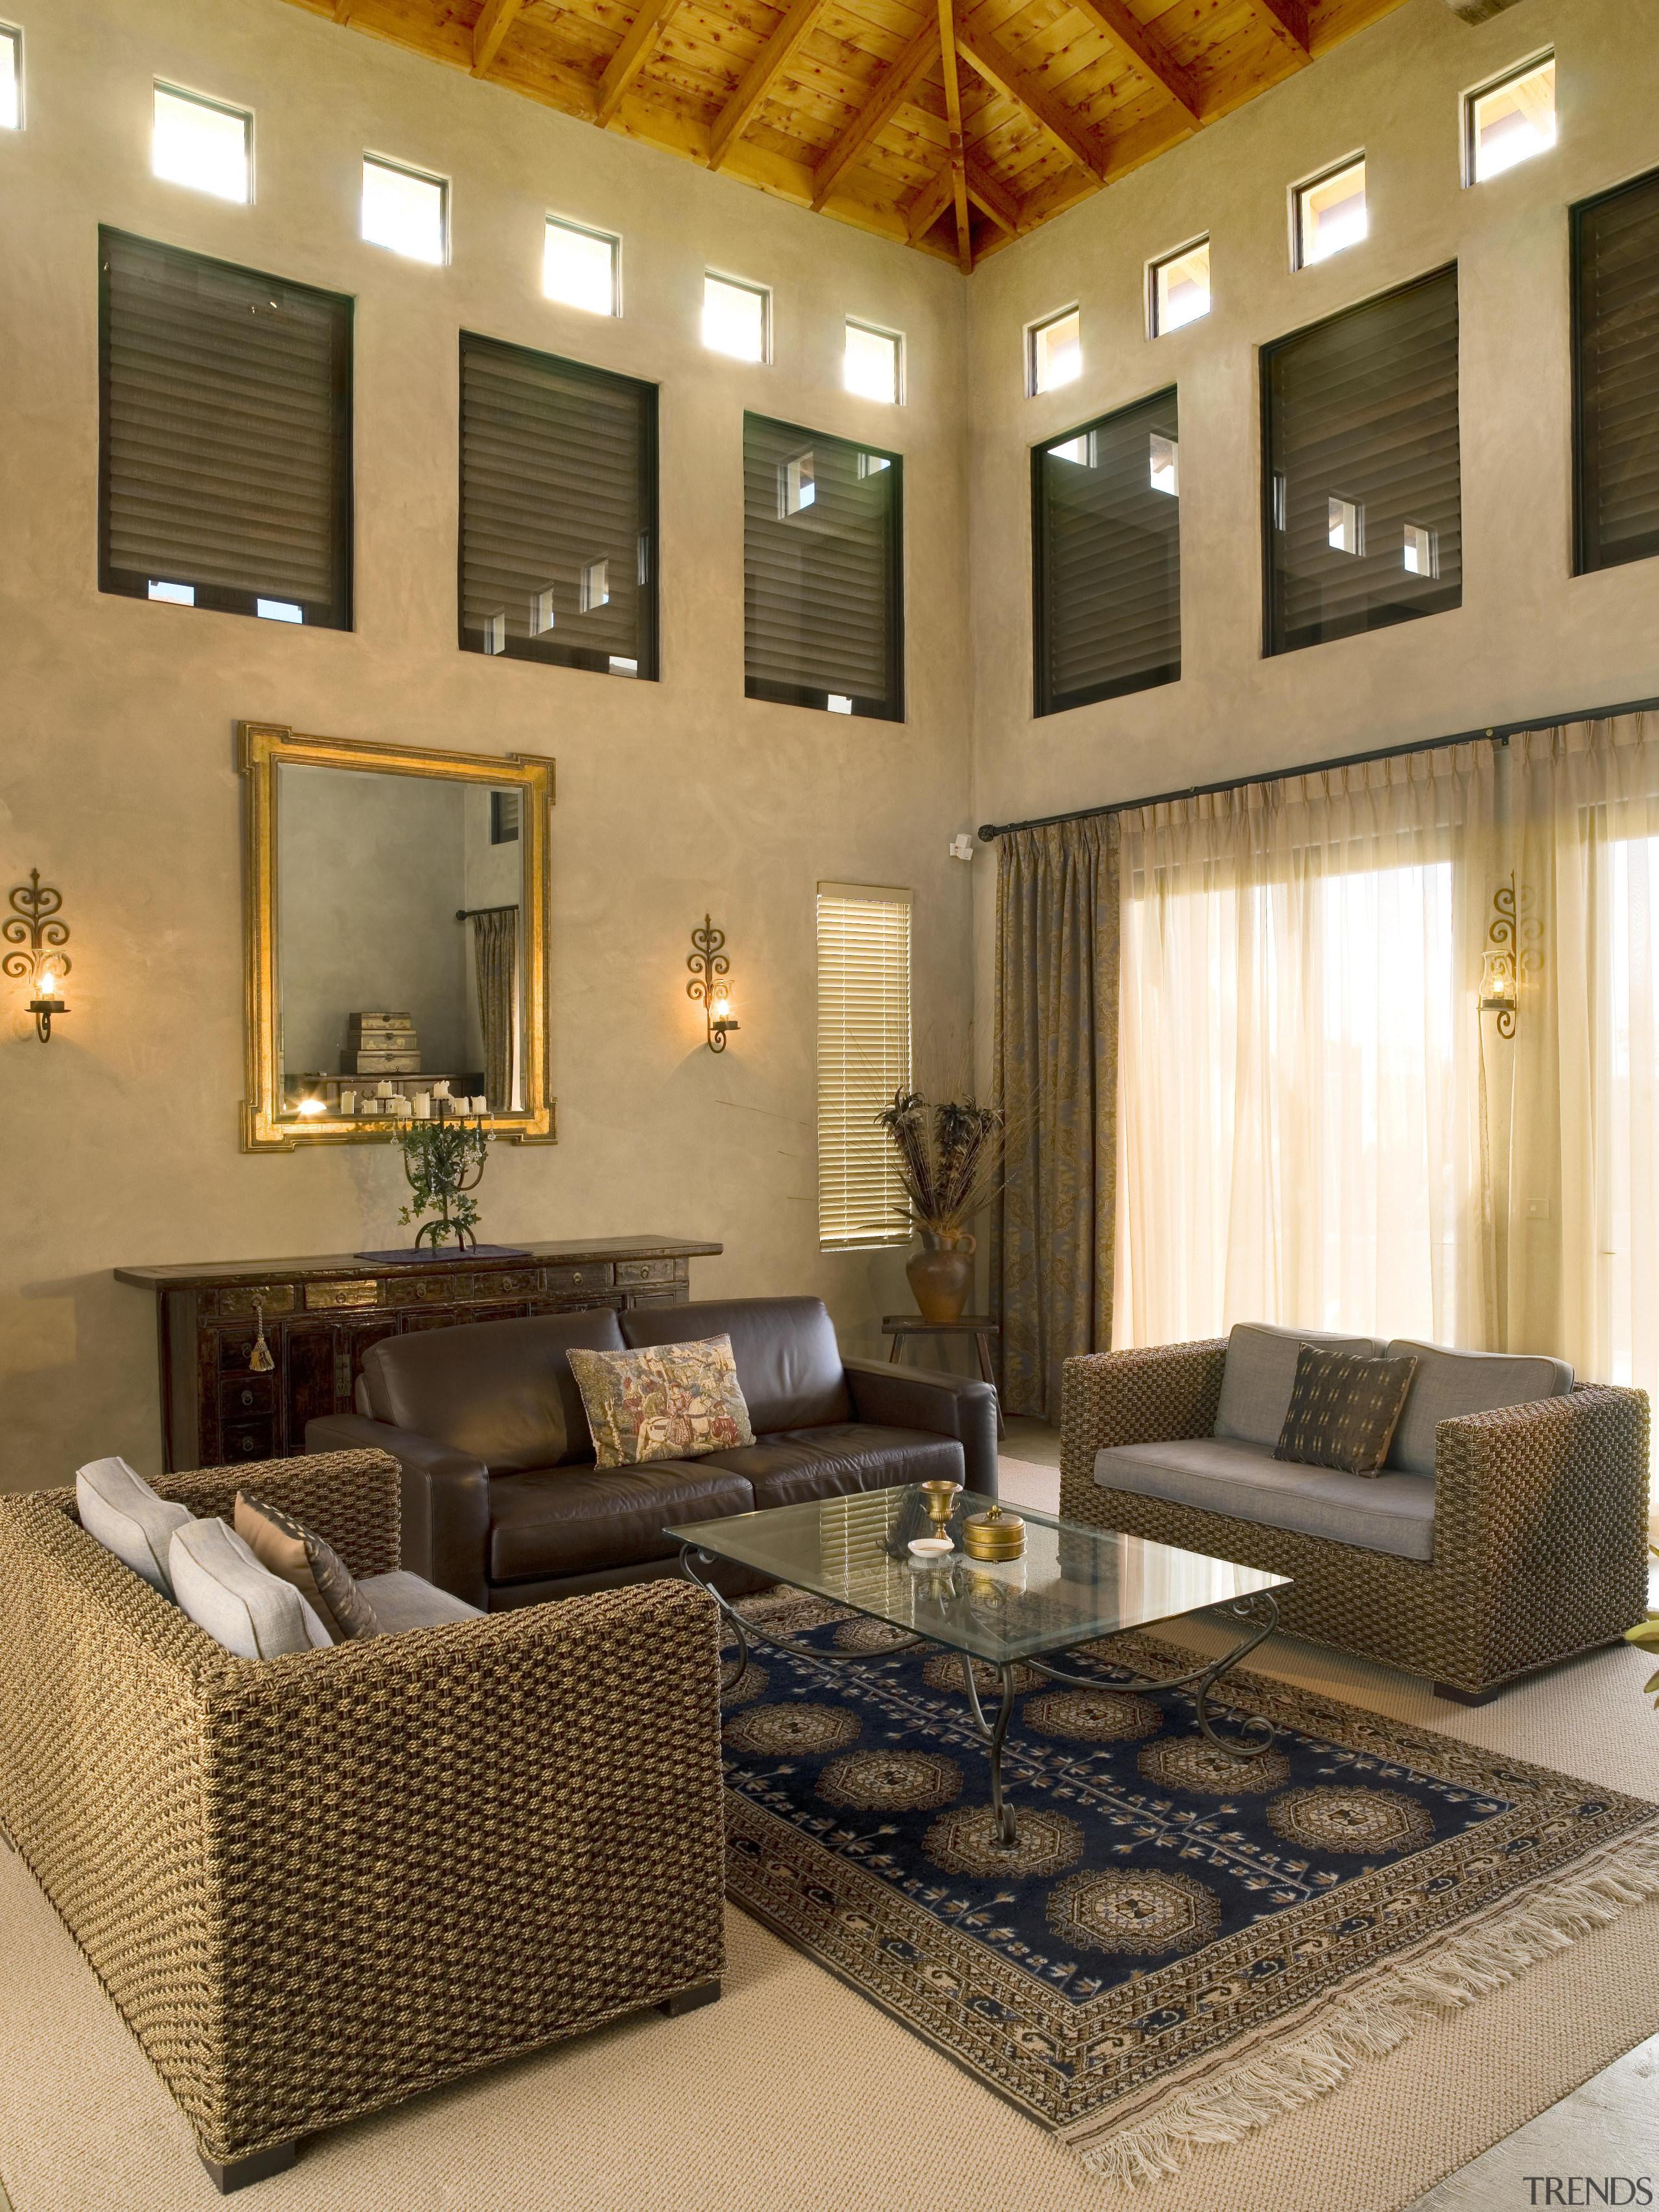 172mangawhai 15 - mangawhai_15 - ceiling   furniture ceiling, furniture, home, interior design, living room, room, wall, brown, orange